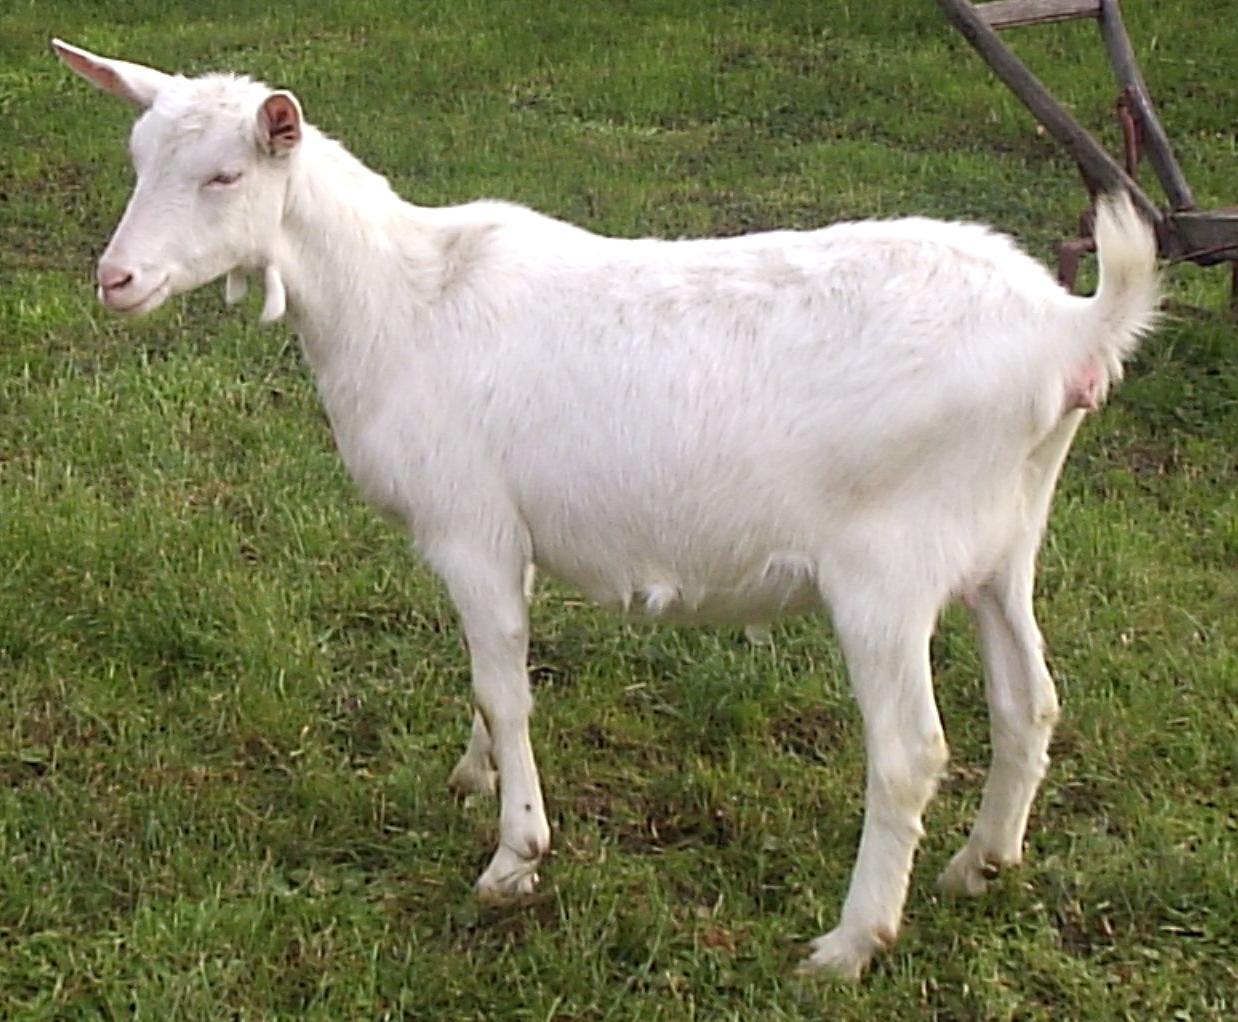 goat png transparent goat png images pluspng barnyard clip art barnyard clip art